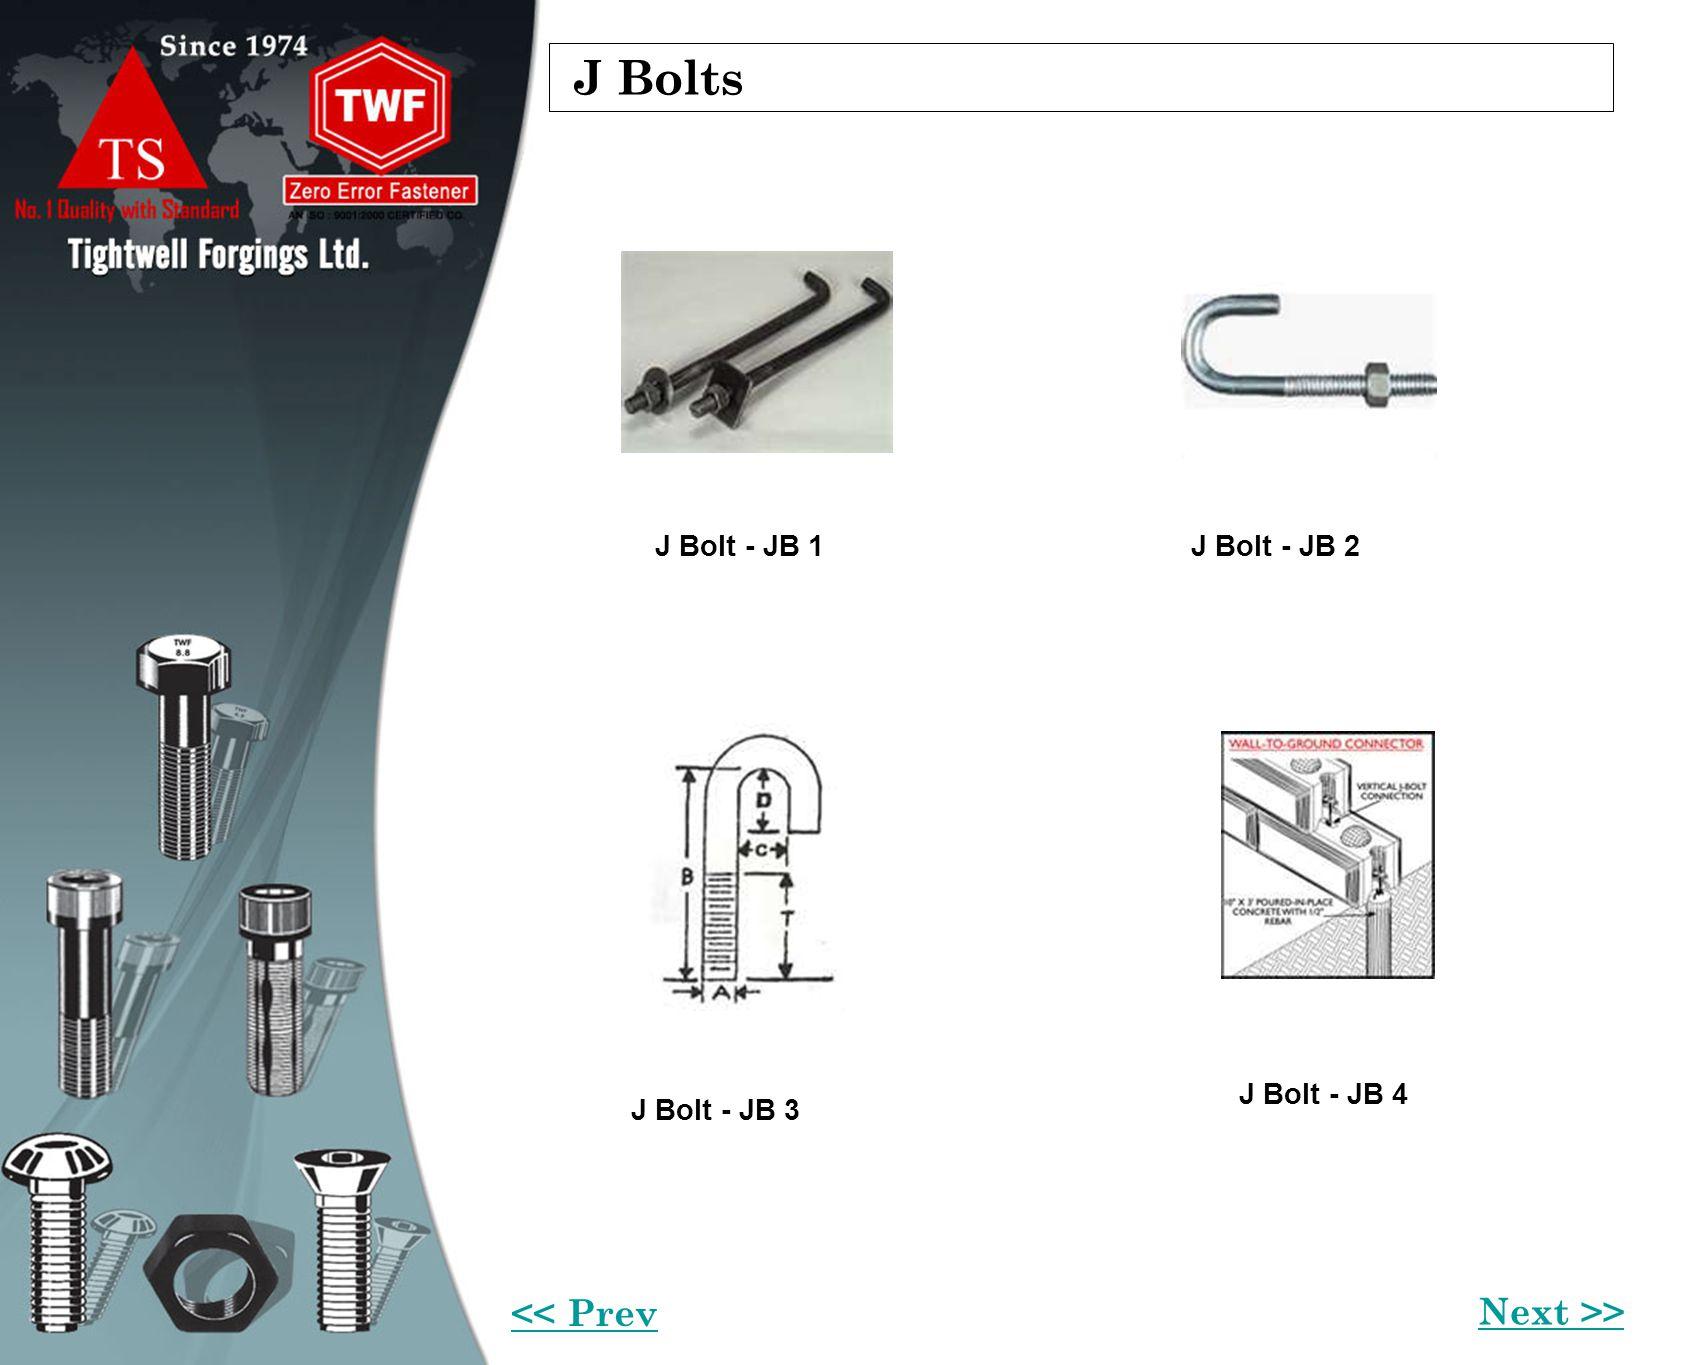 J Bolts J Bolt - JB 1J Bolt - JB 2 J Bolt - JB 4 J Bolt - JB 3 Next >> << Prev